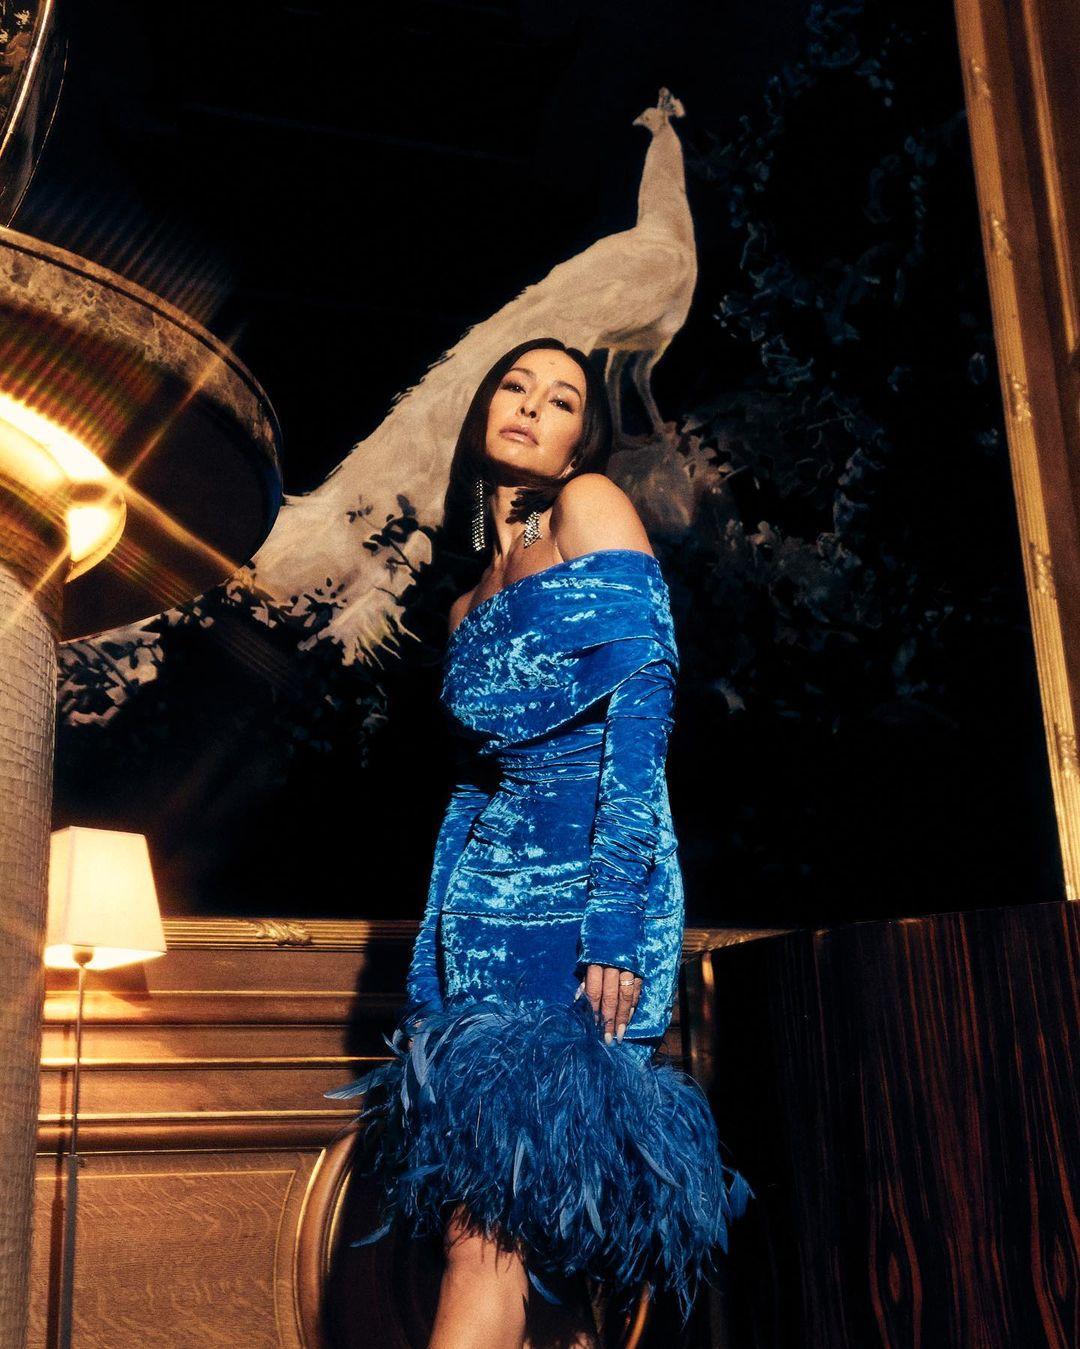 Sabrina Sato Vestido azul Glamour 02